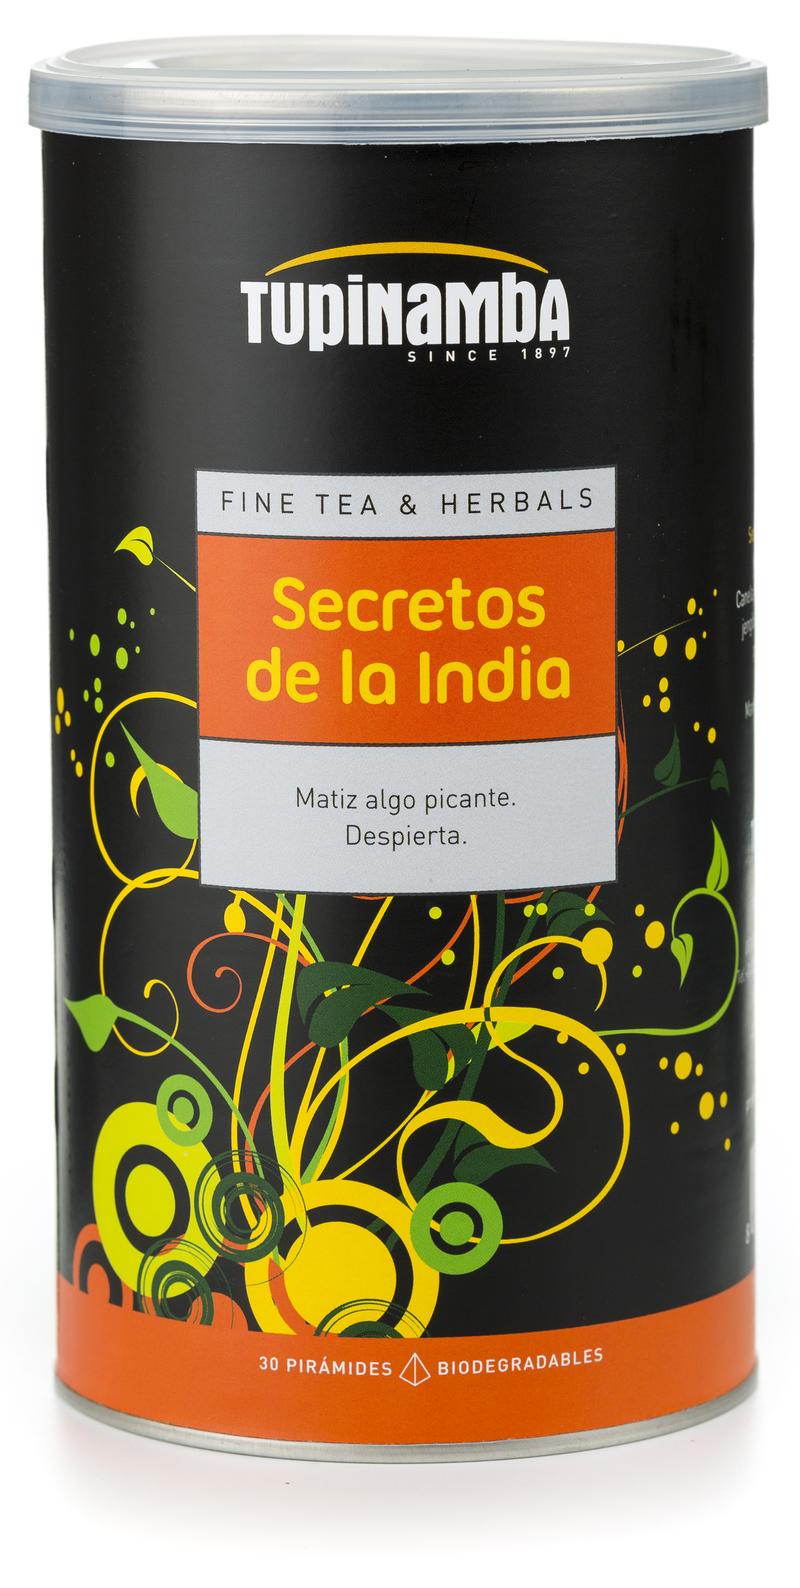 Secretos de la india tupinamba - Secretos de india ...